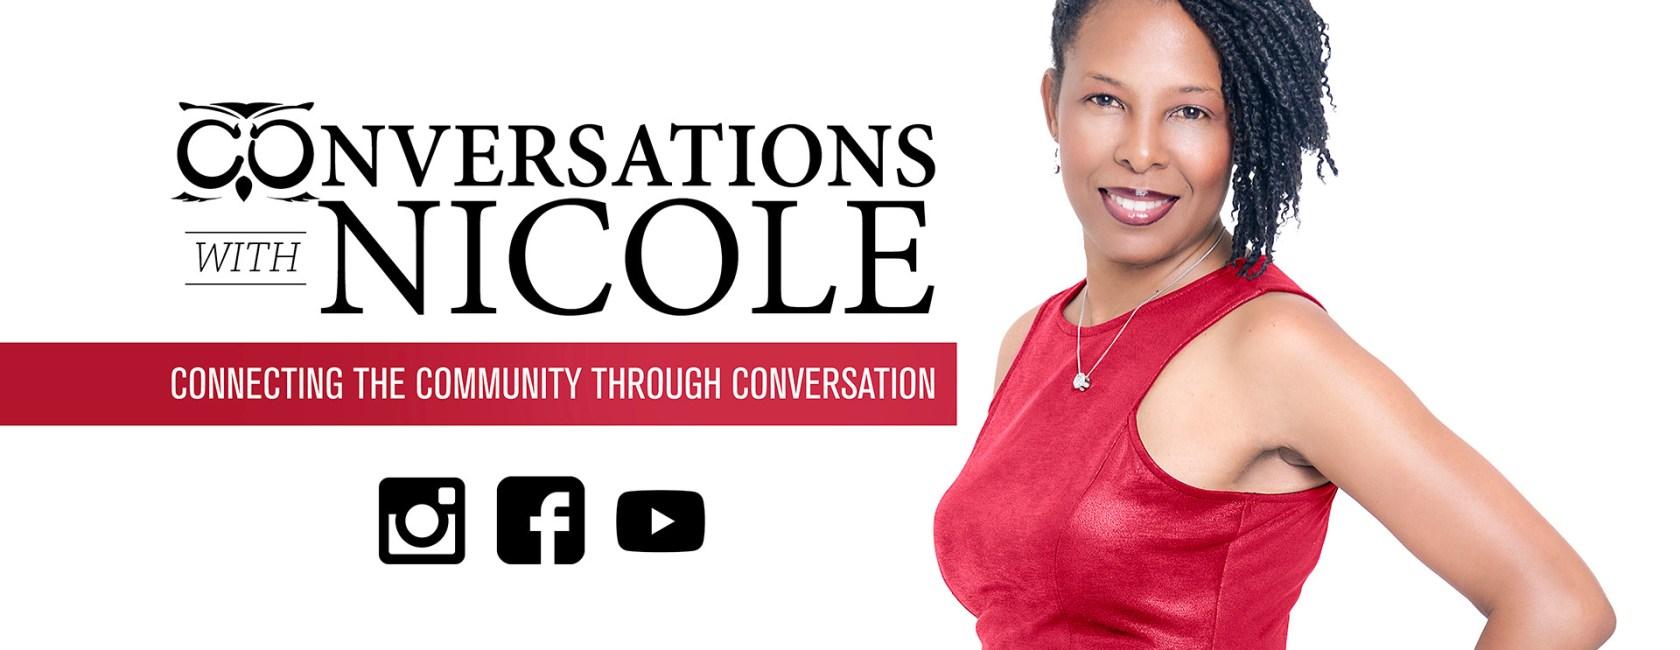 Conversations With Nicole